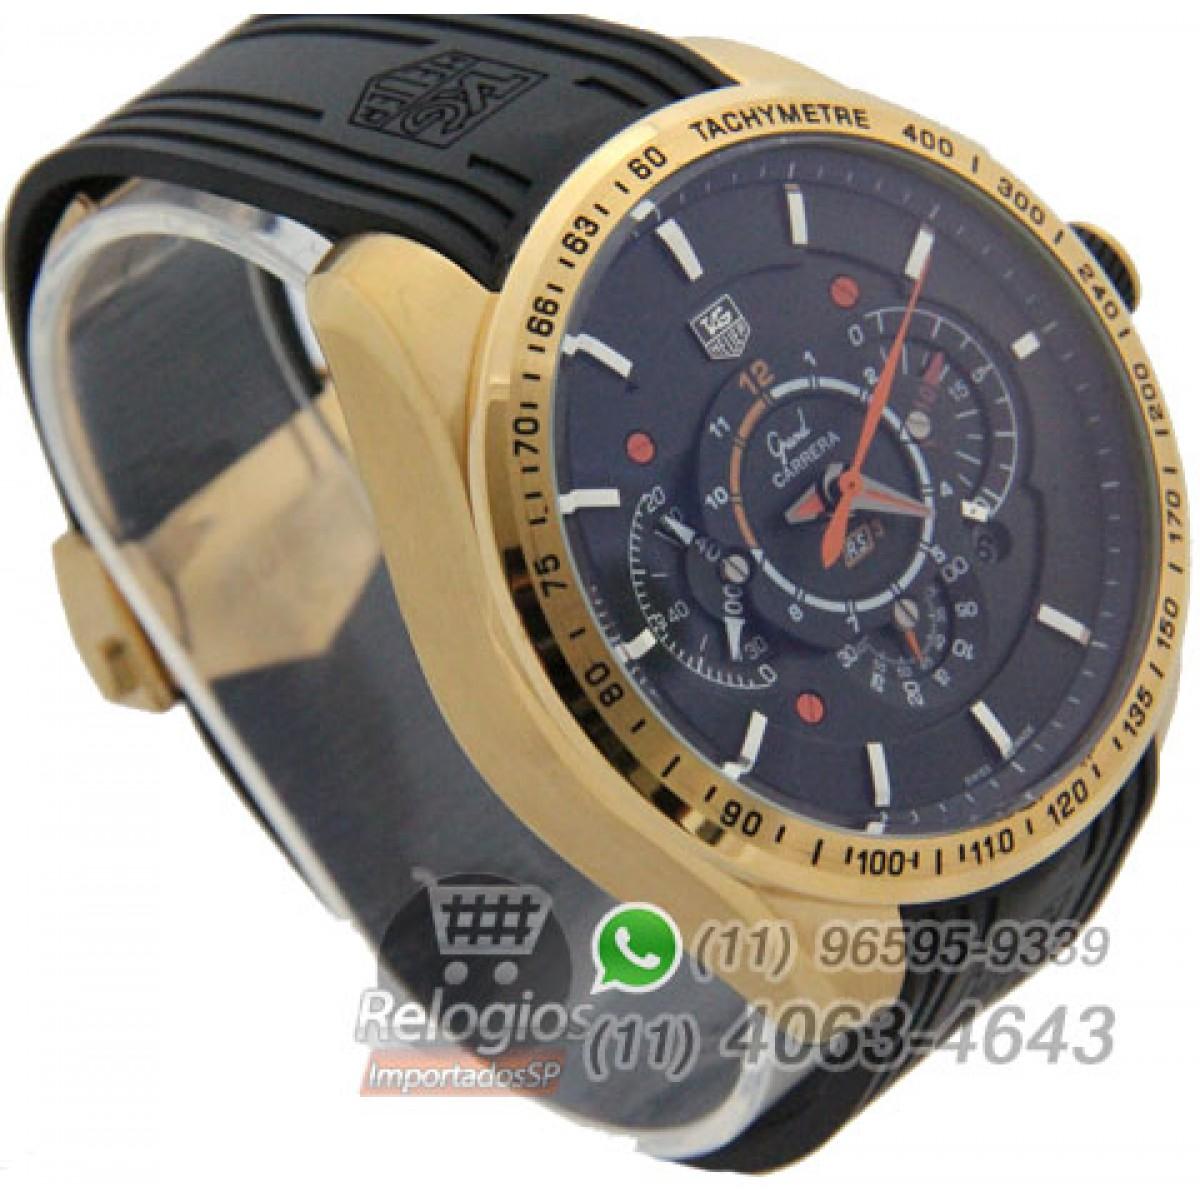 66bfd5c0c10 Relógio Réplica Tag Heuer Grand Carrera Rs3 Preto Laranja ( New )